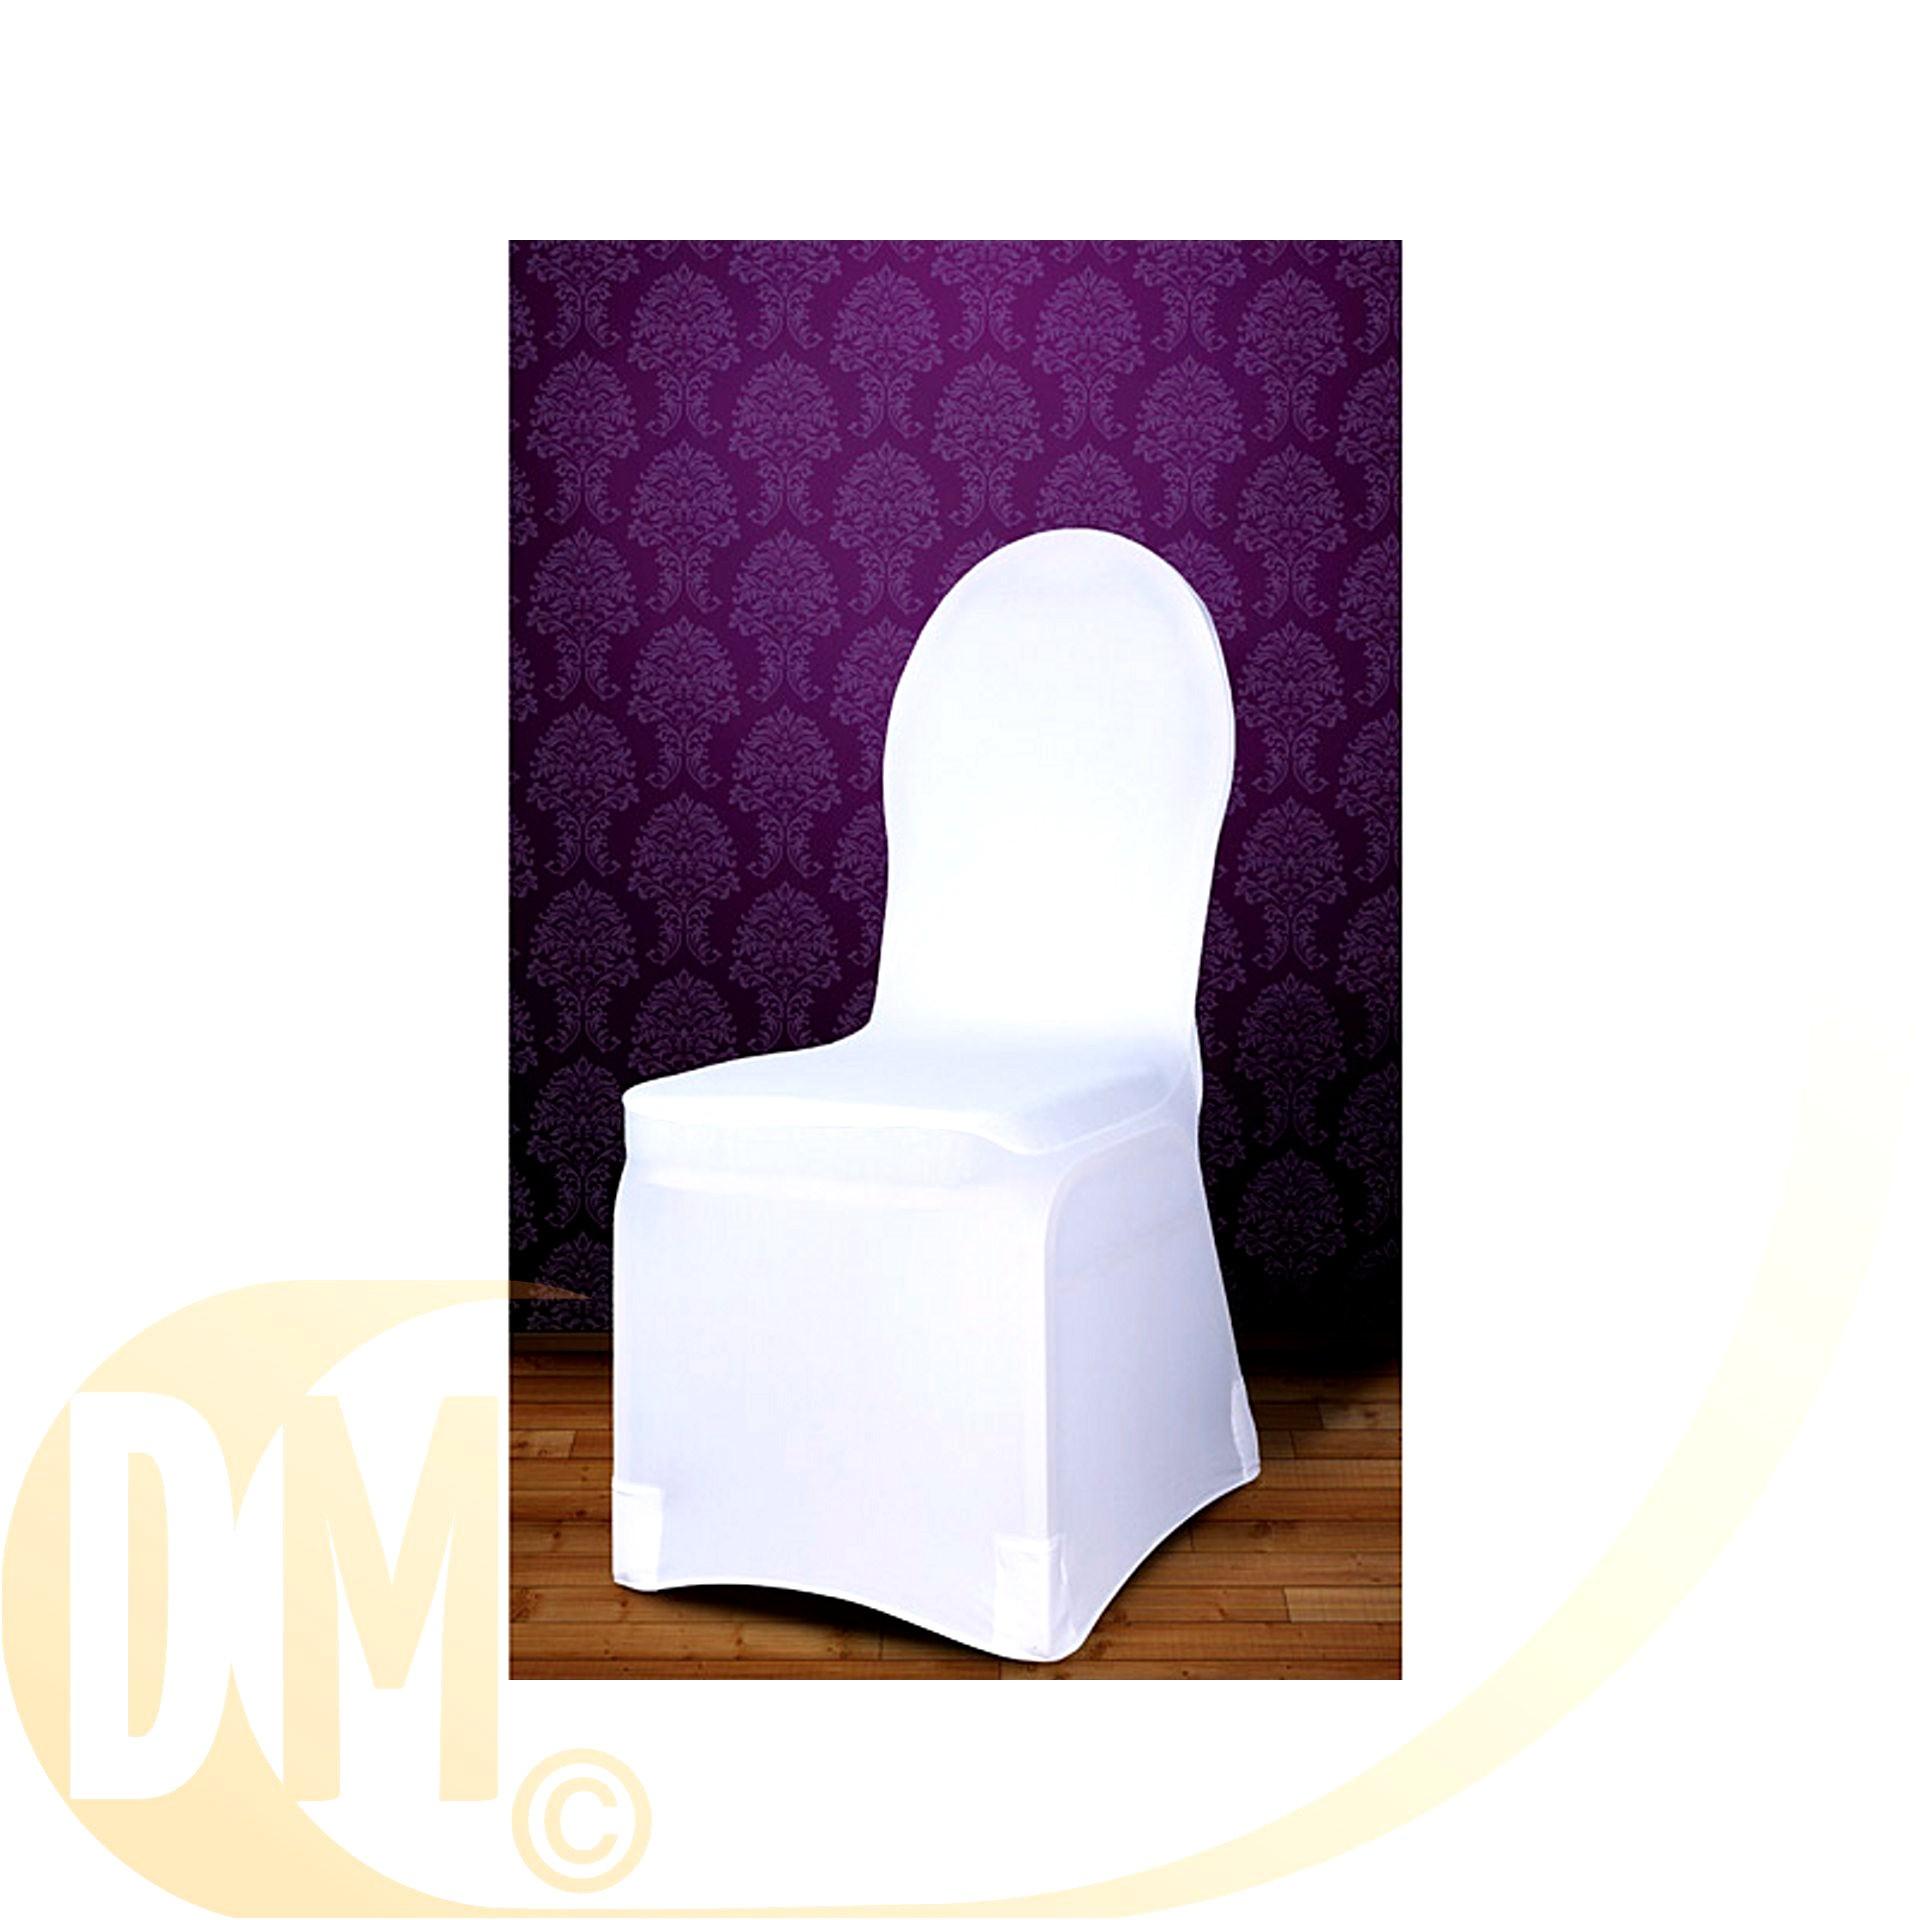 Petite Table Pliante Gifi Luxe Image Housse De Chaise Jetable Gifi Best Housse Chaise Pliante Mariage